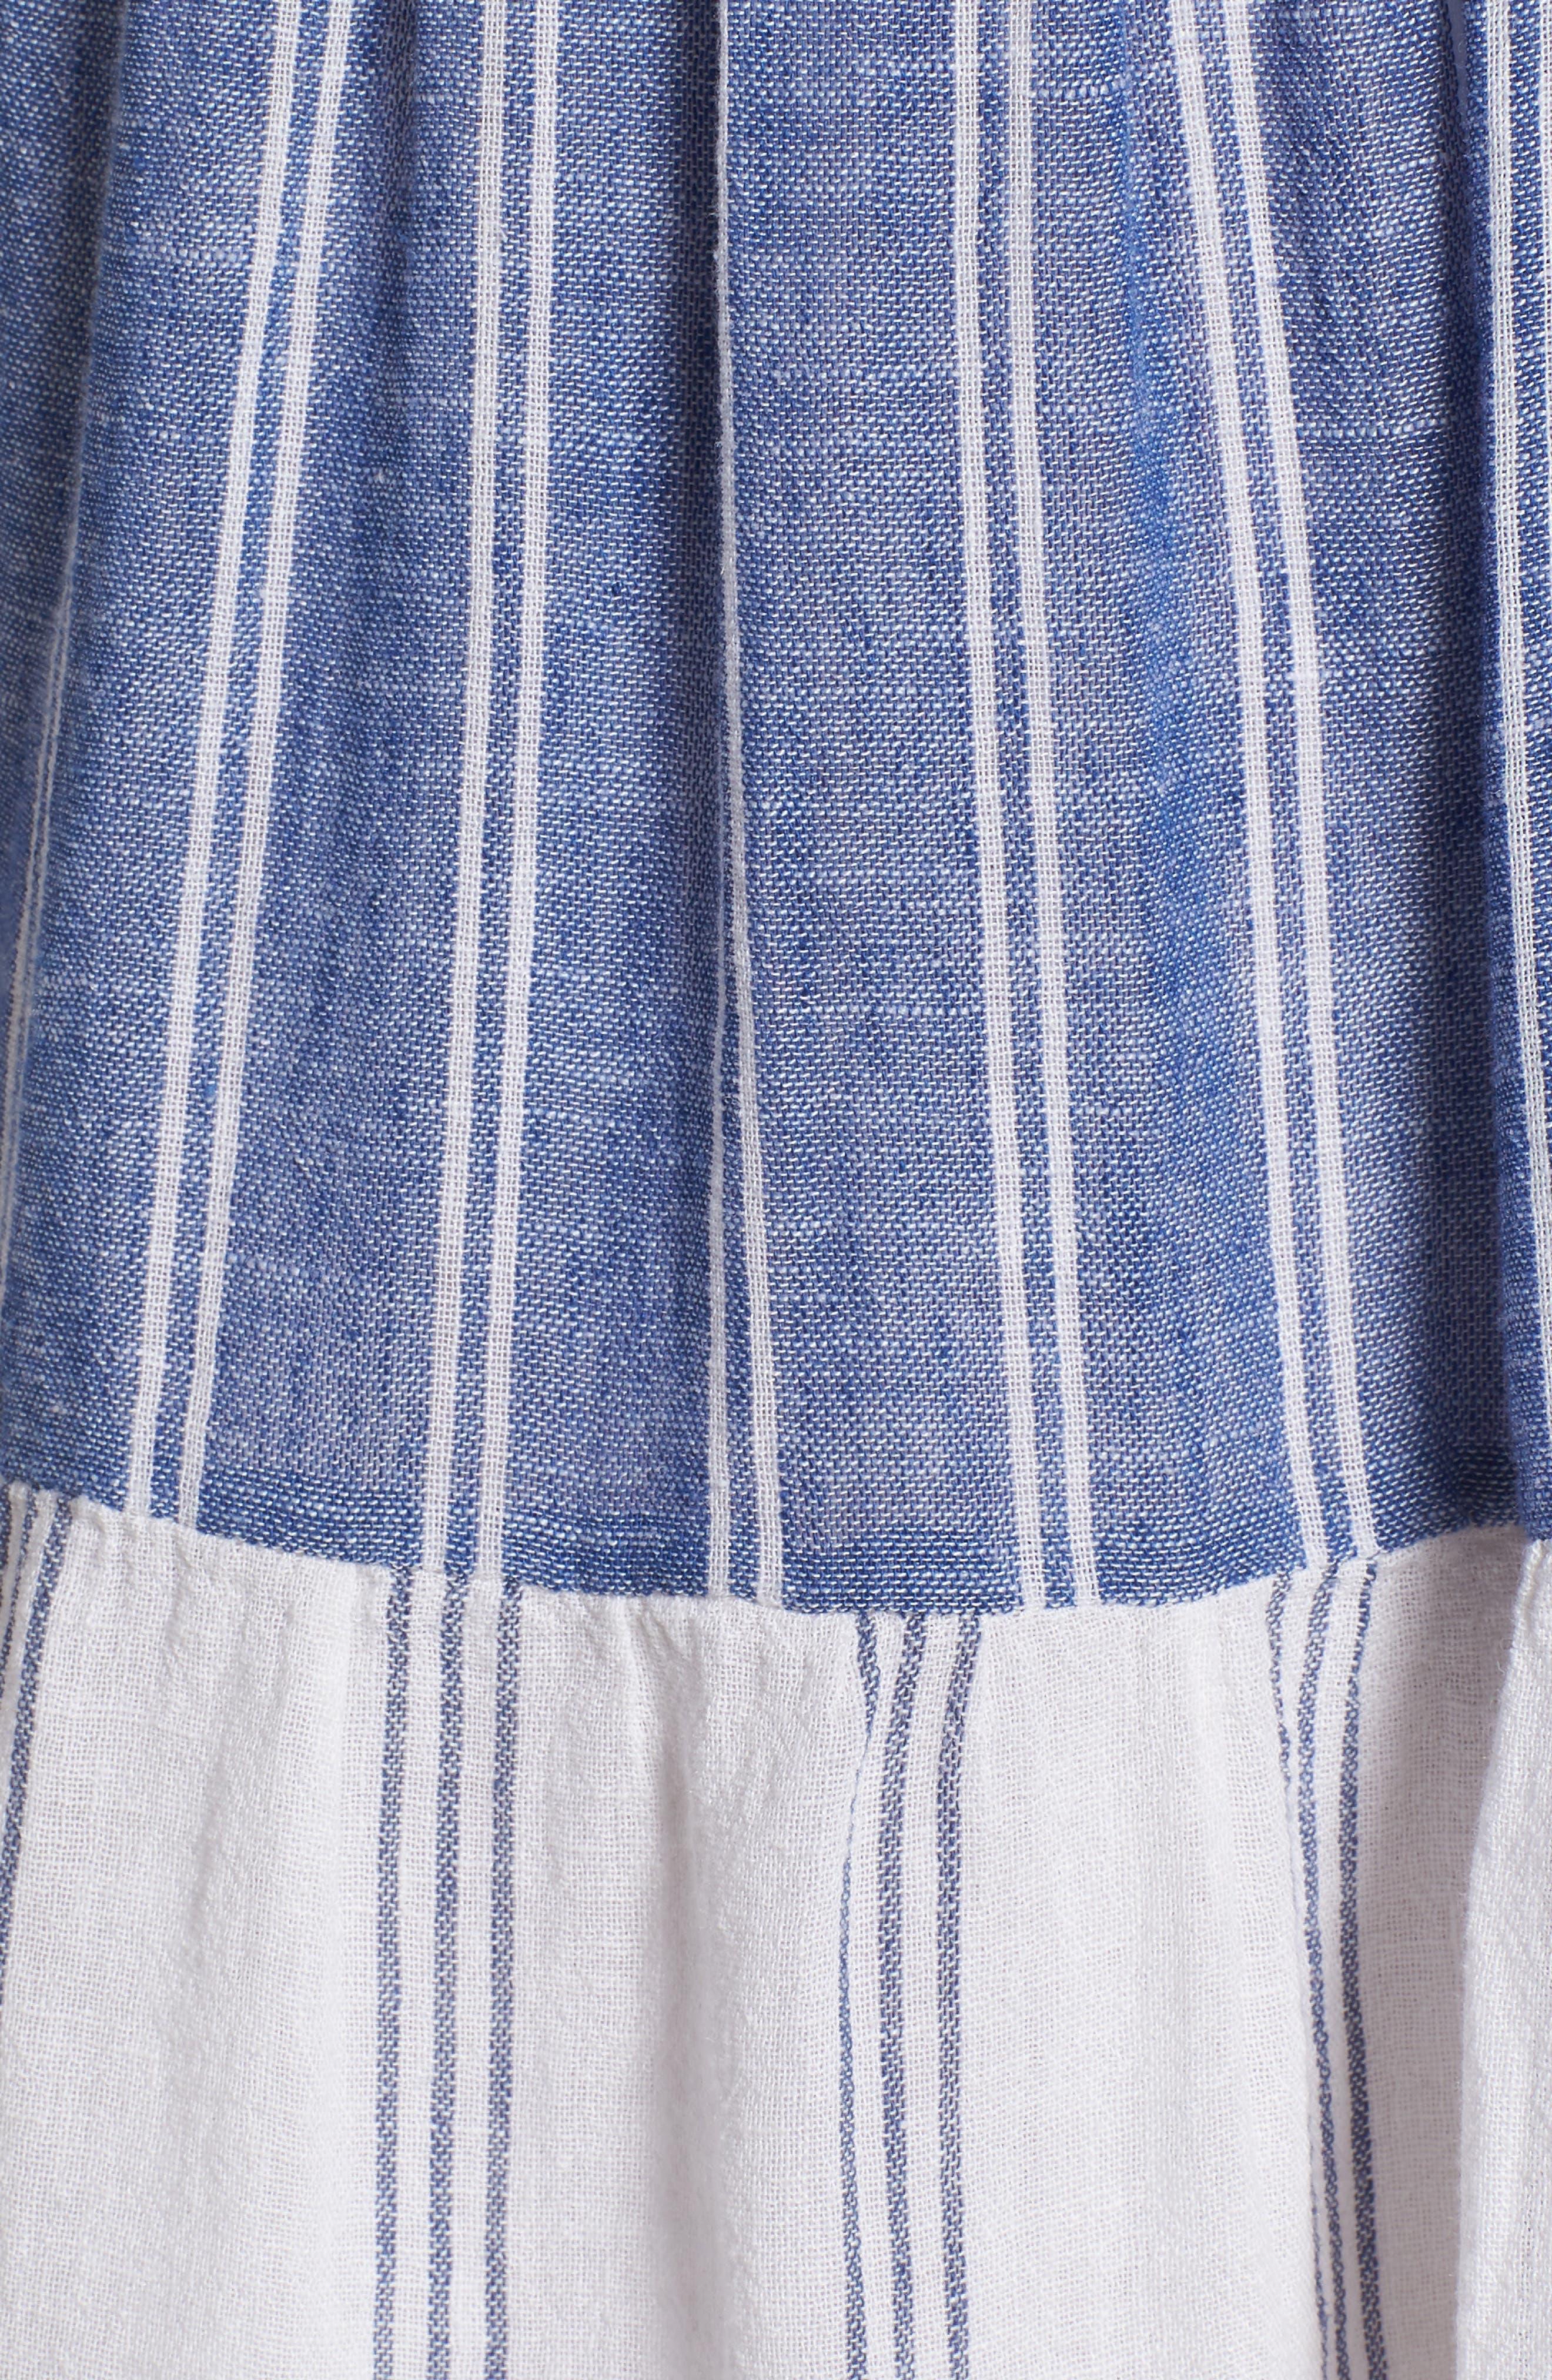 Mattie Dress,                             Alternate thumbnail 5, color,                             Mixed Blues Stripe